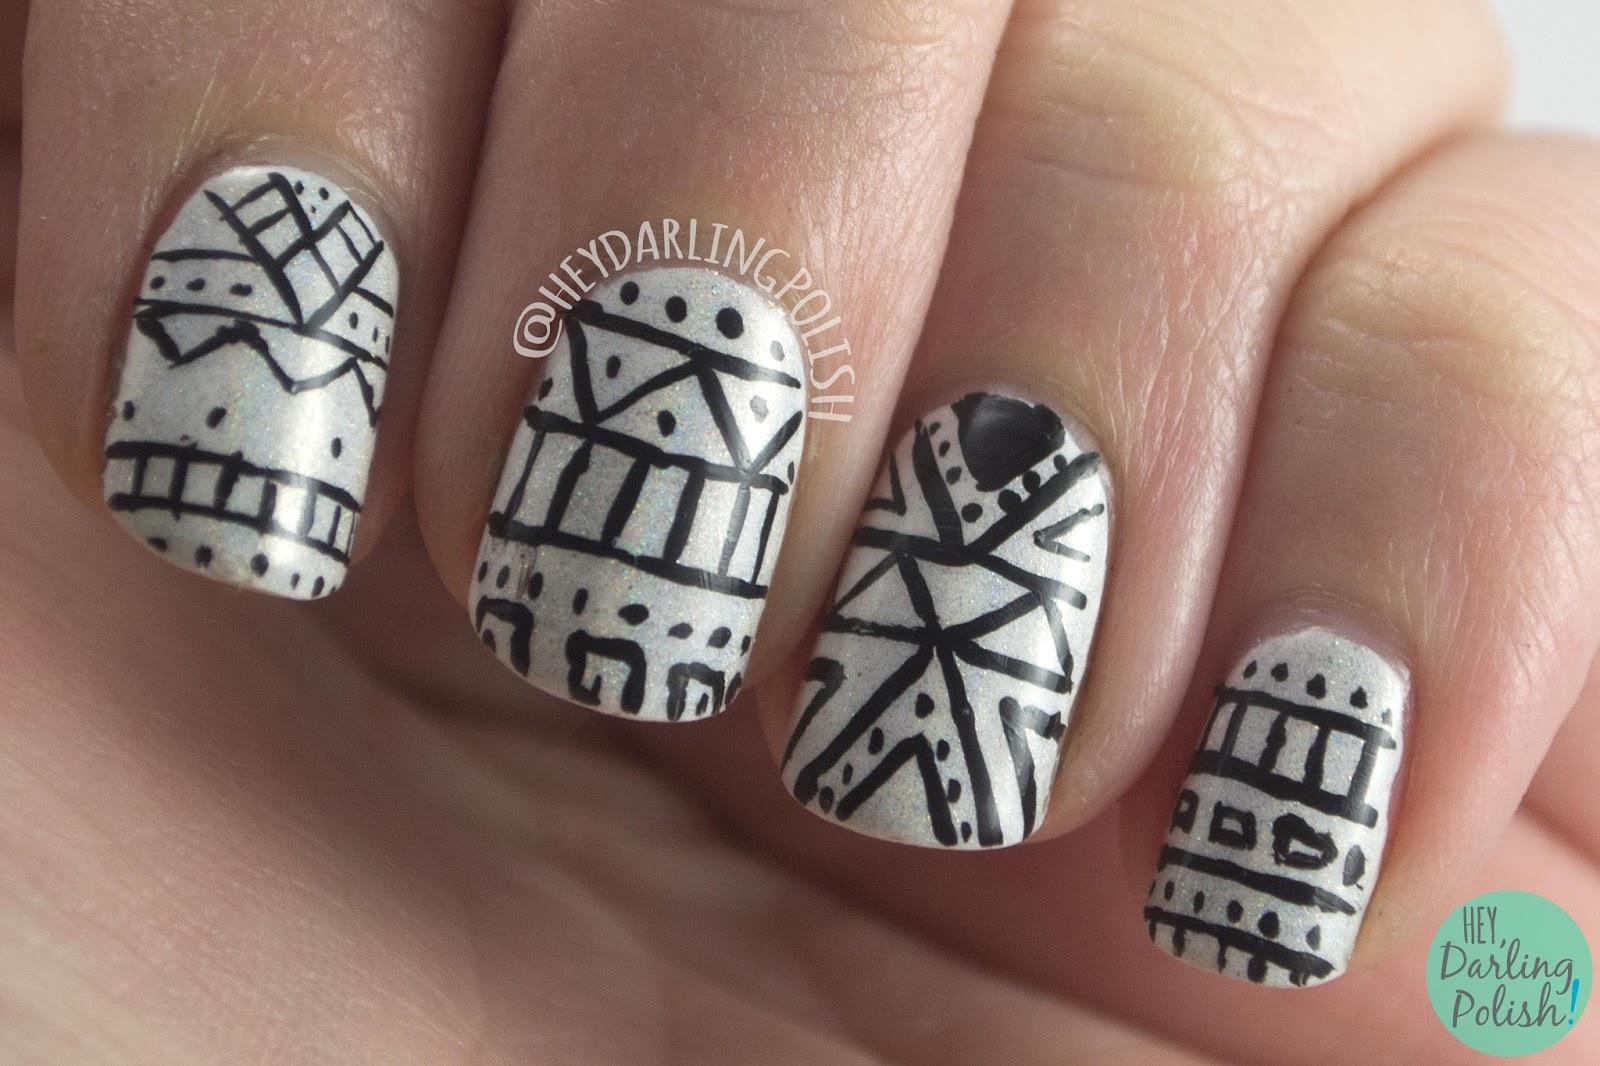 nails, nail art, nail polish, hey darling polish, tribal, black, white, geometric, the nail challenge collaborative